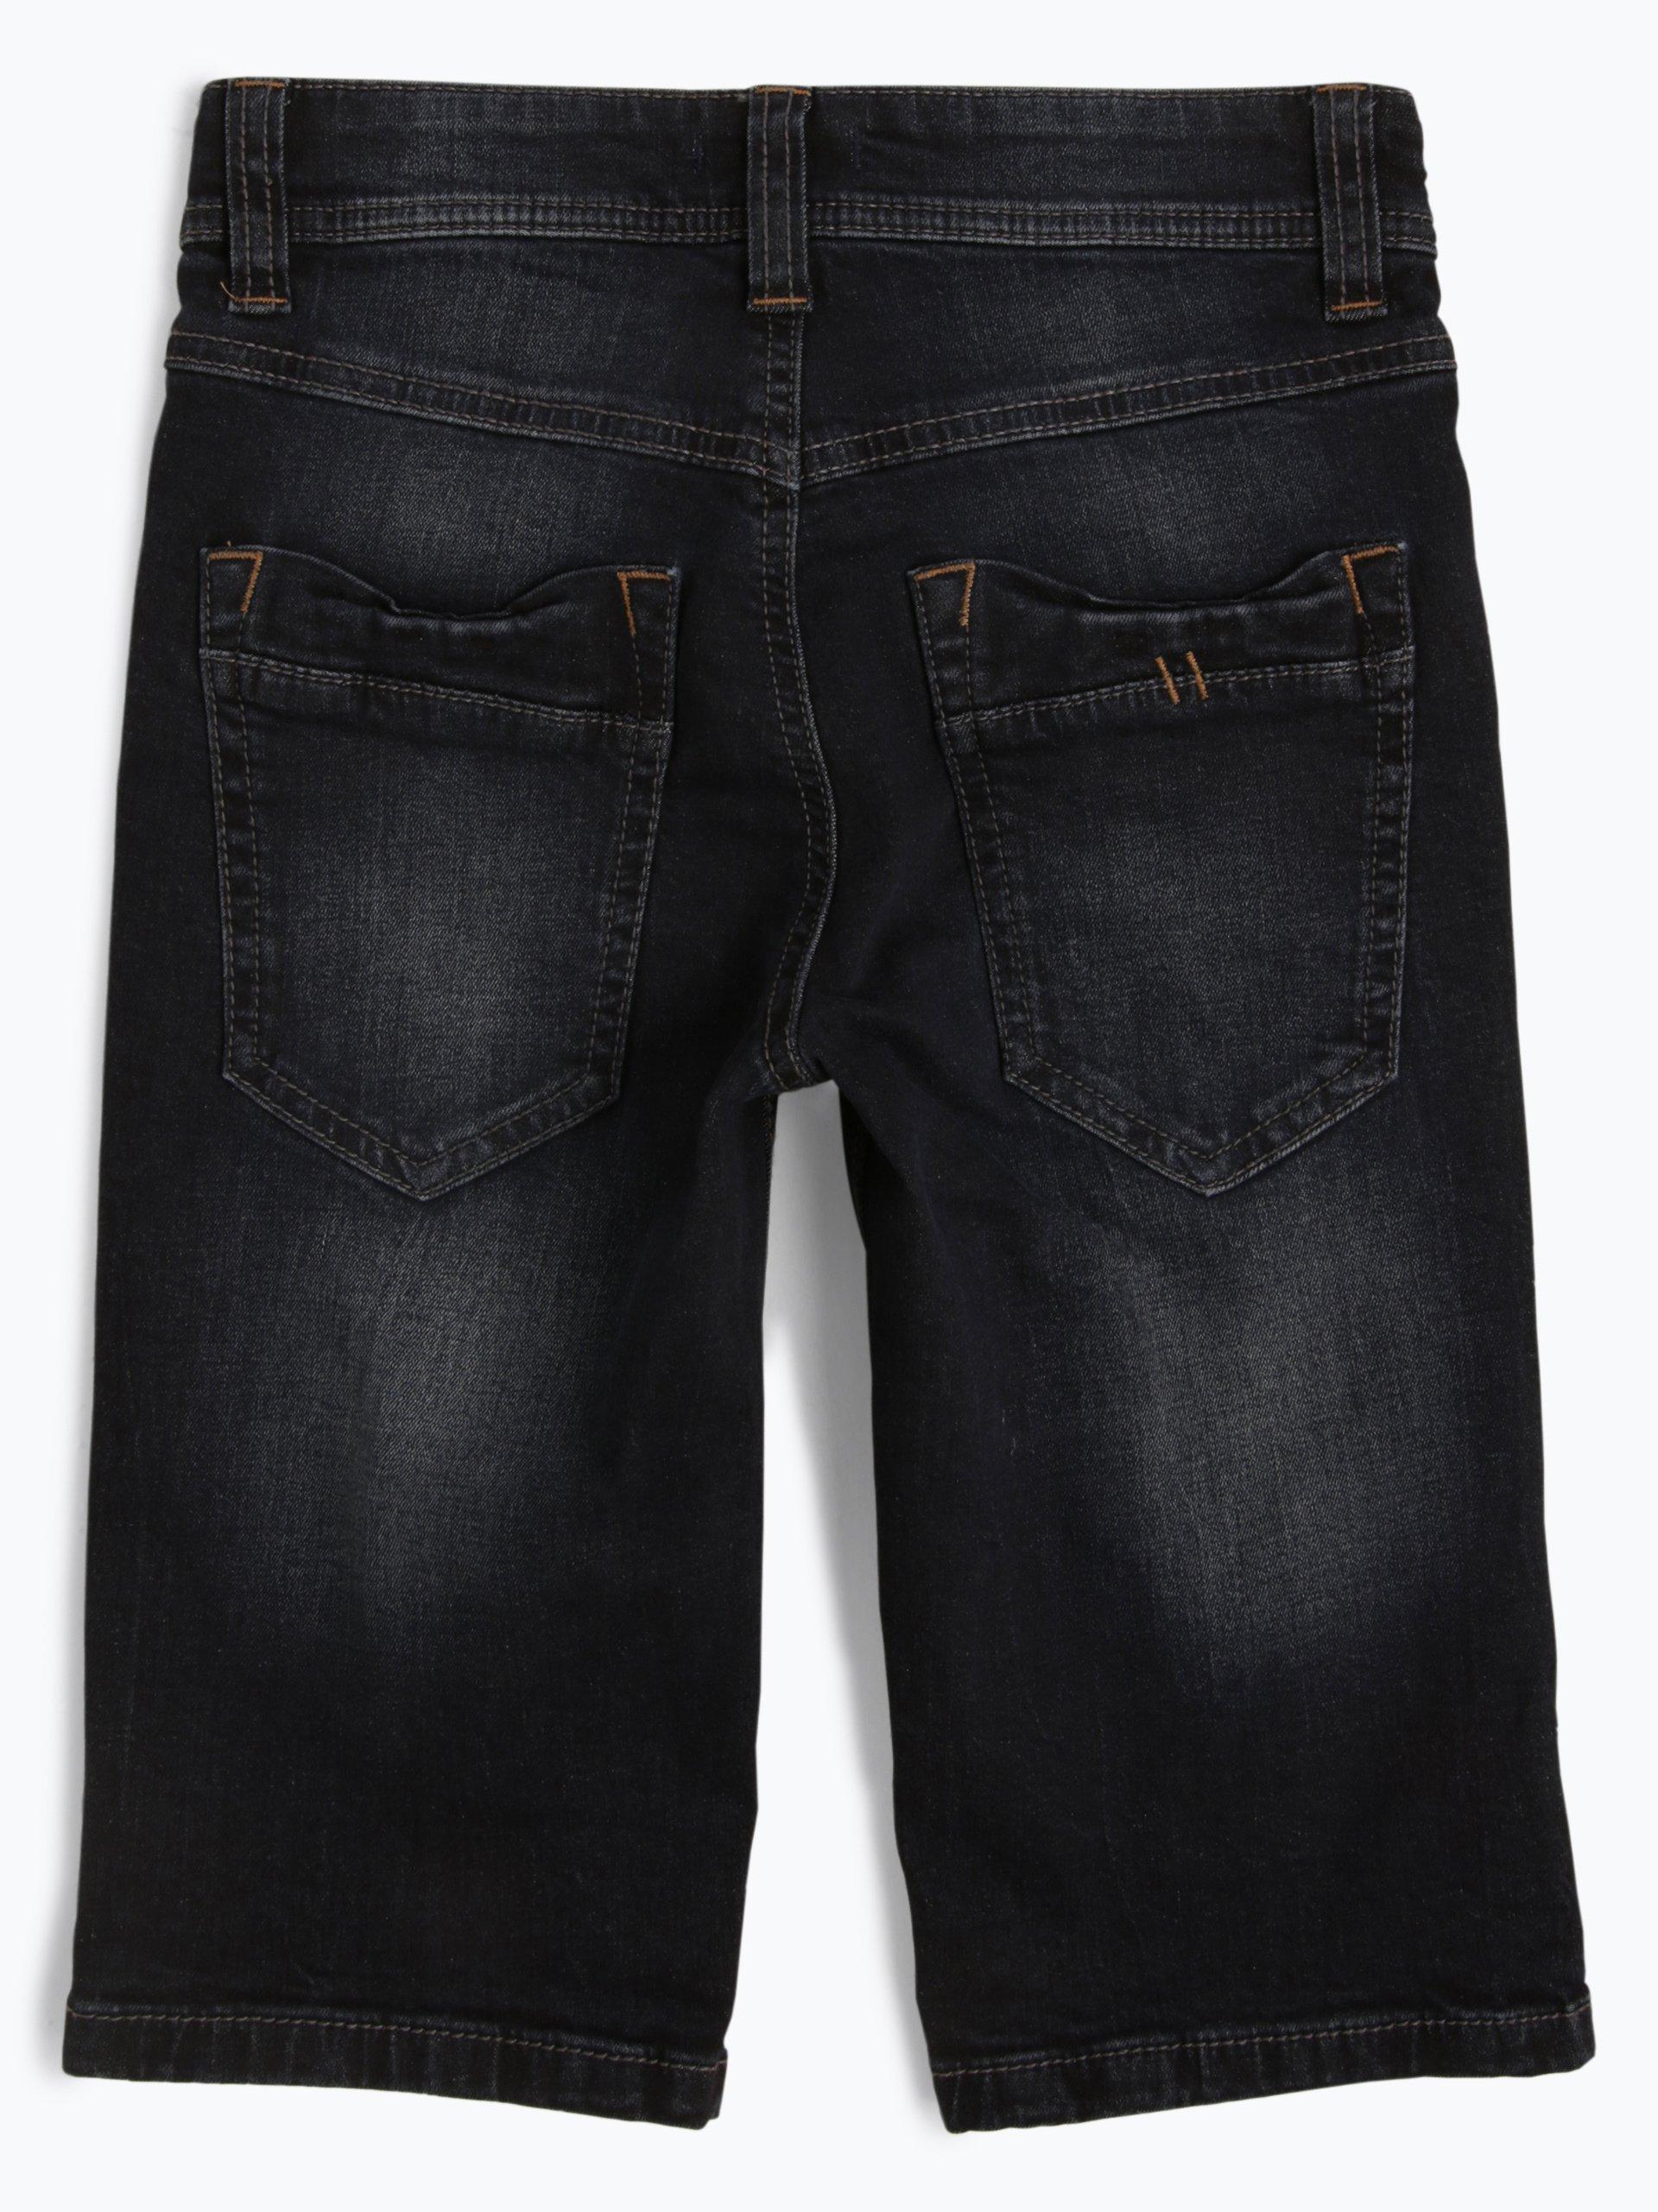 s.Oliver Casual Jungen Jeans-Bermuda - Seattle